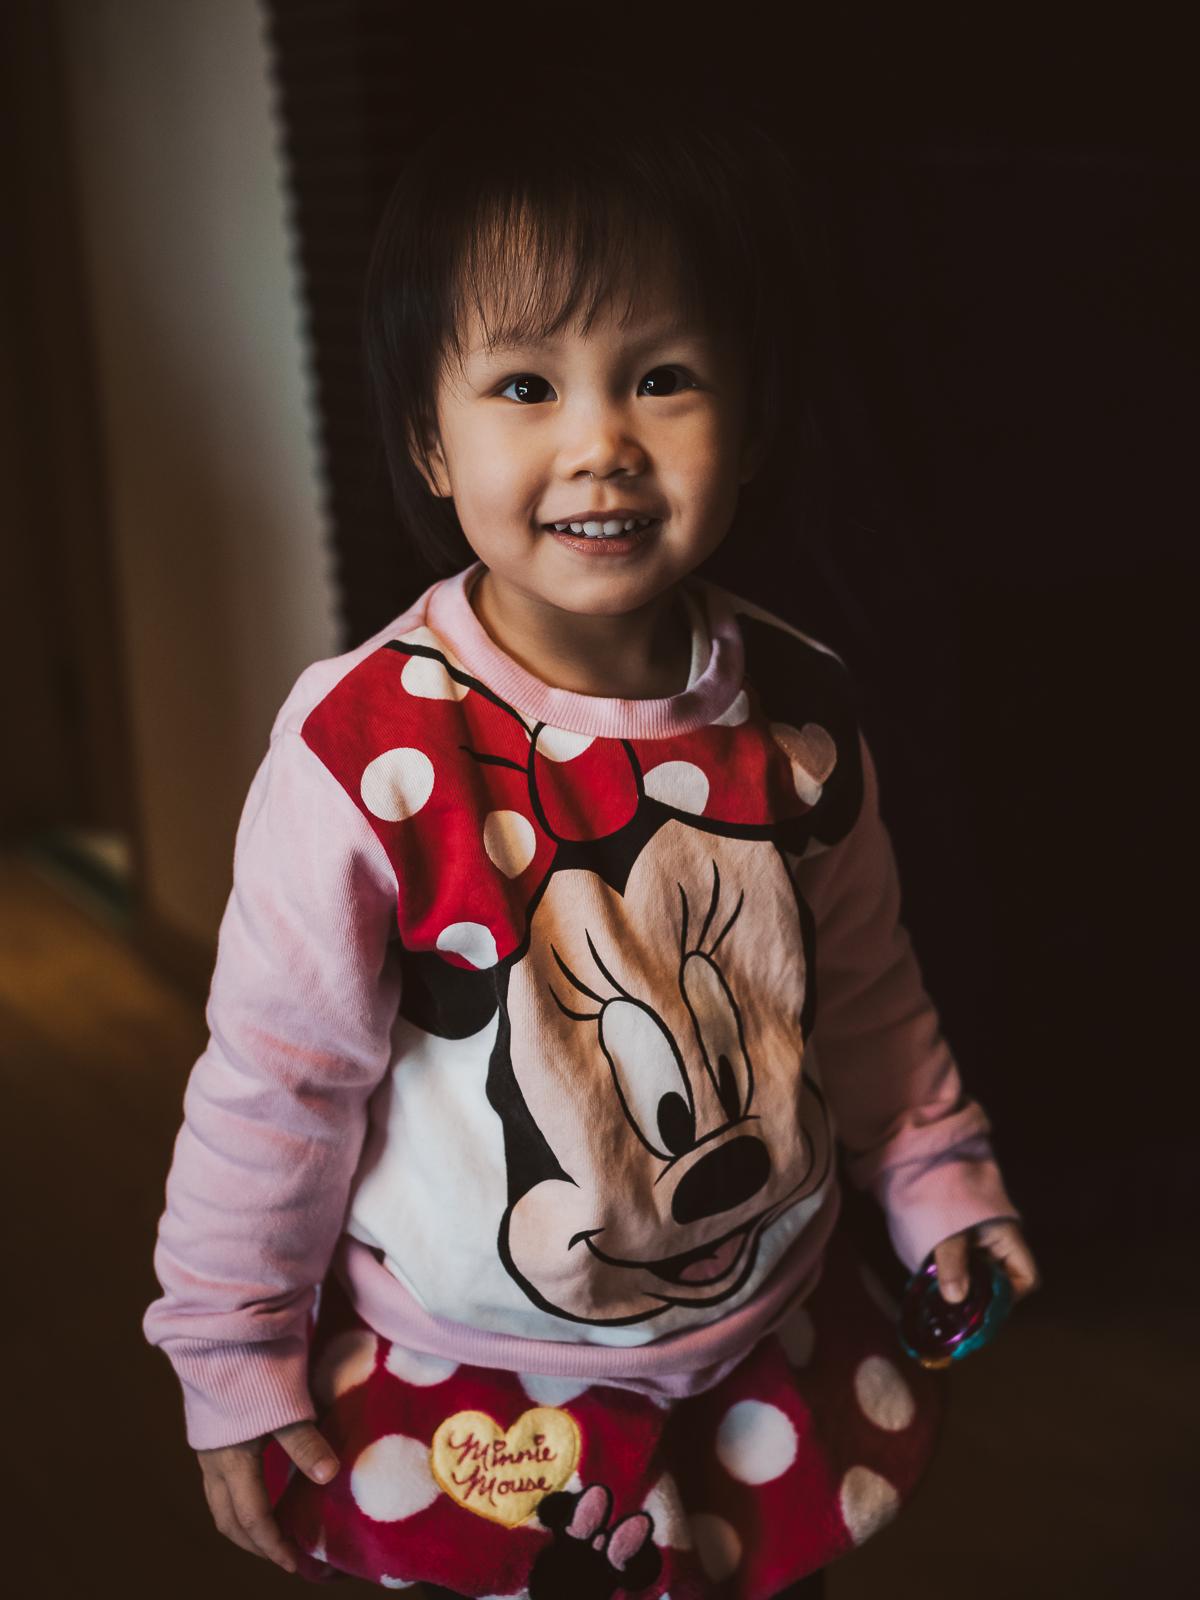 Eiffle Chan Family Portrait - Olympus EMaMarkii2512 - Yes! Please Enjoy by Fanning Tseng-2.jpg